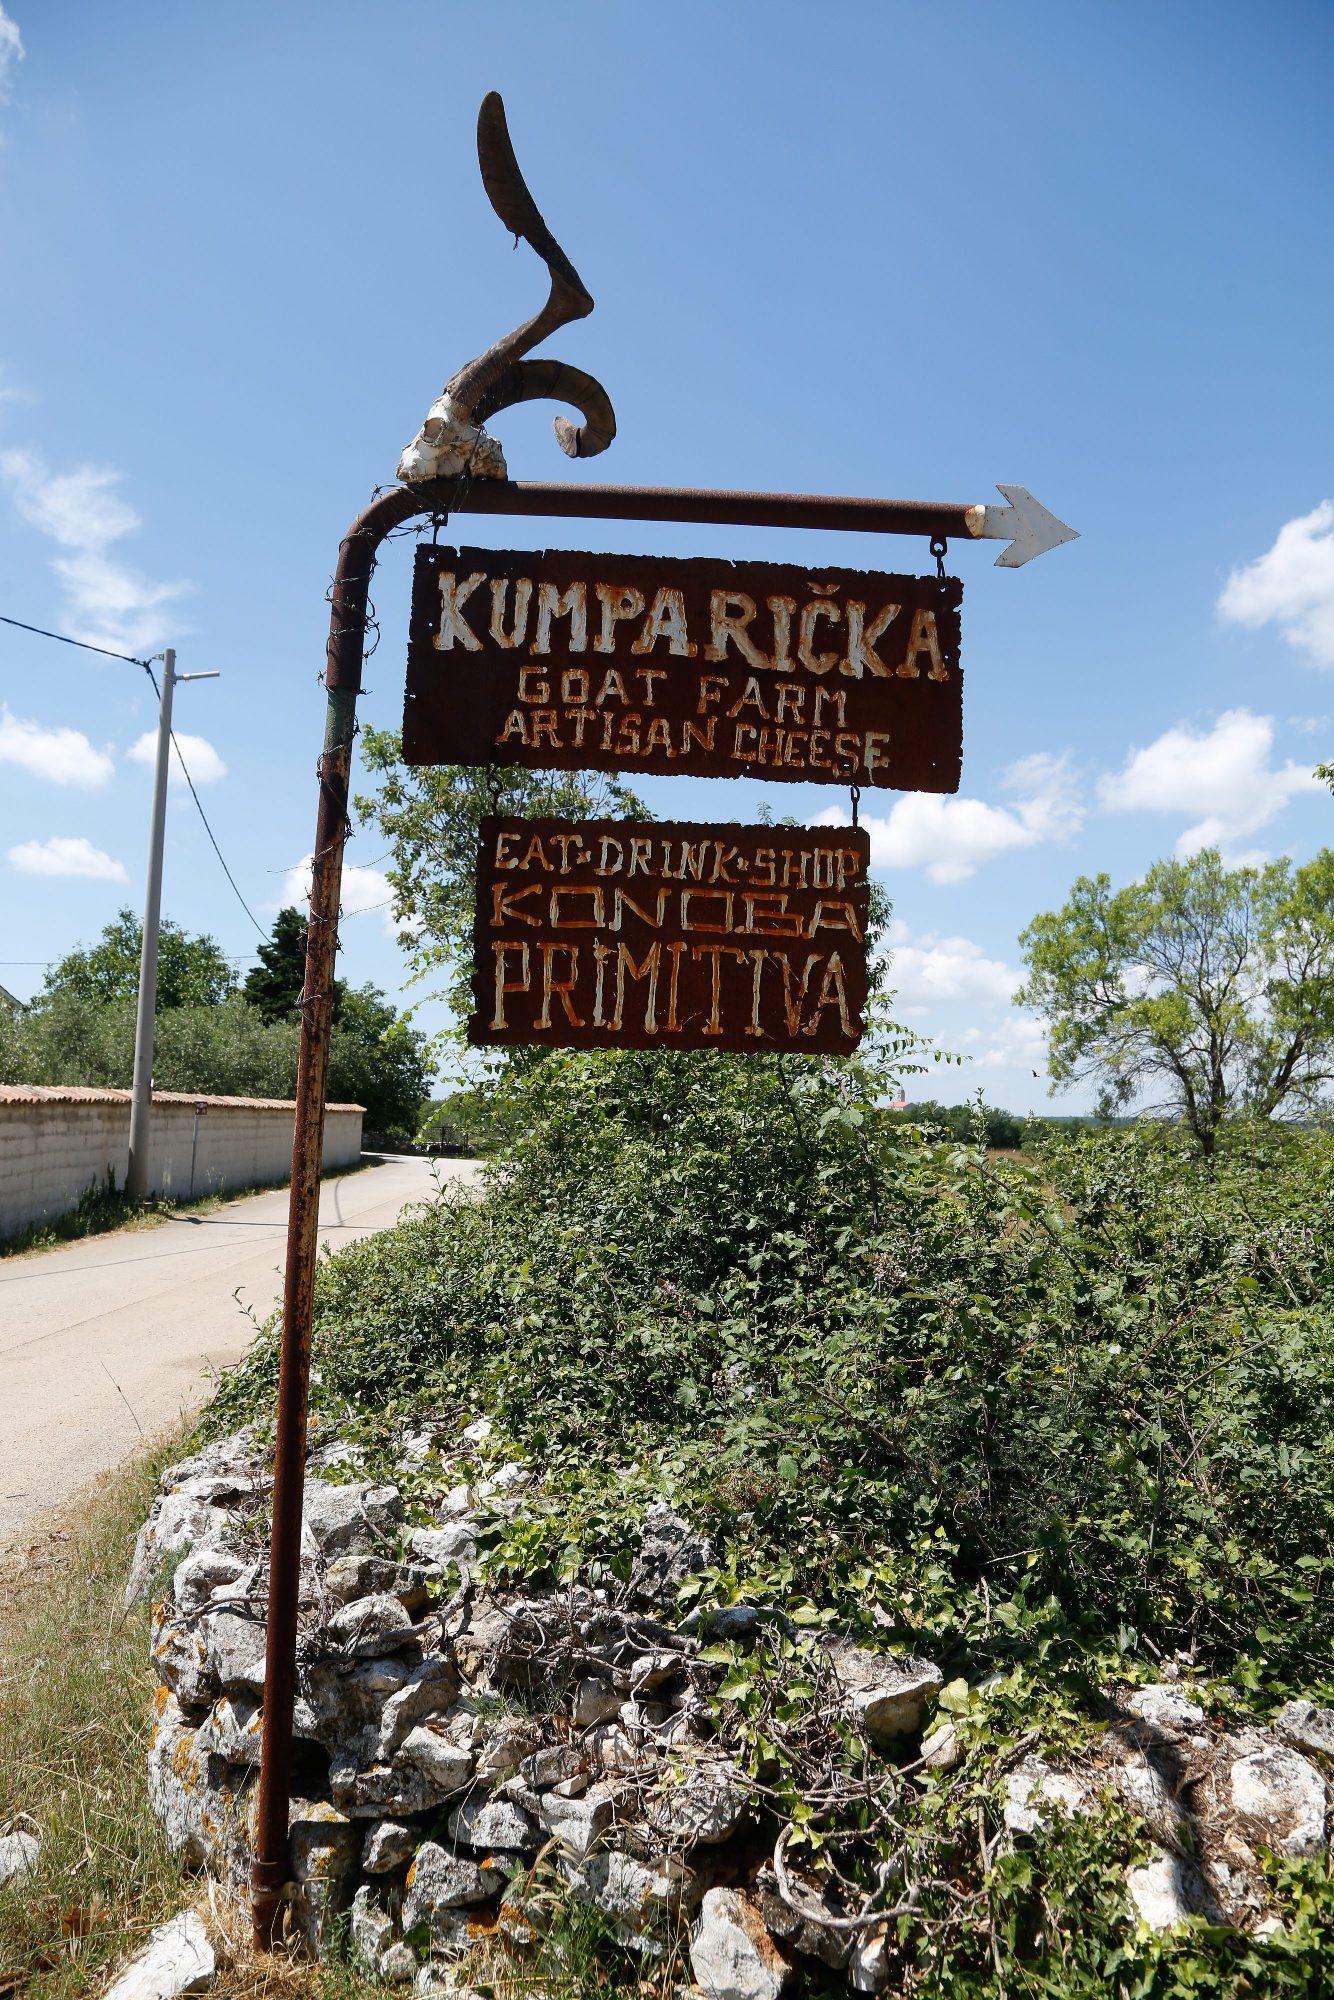 Stancija Kumparicka, 130618. Ales Winkler, vlasnik stancija Kumparicka, uzgajivac koza i proizvodjac kozjeg sira.  Foto: Goran Sebelic / CROPIX